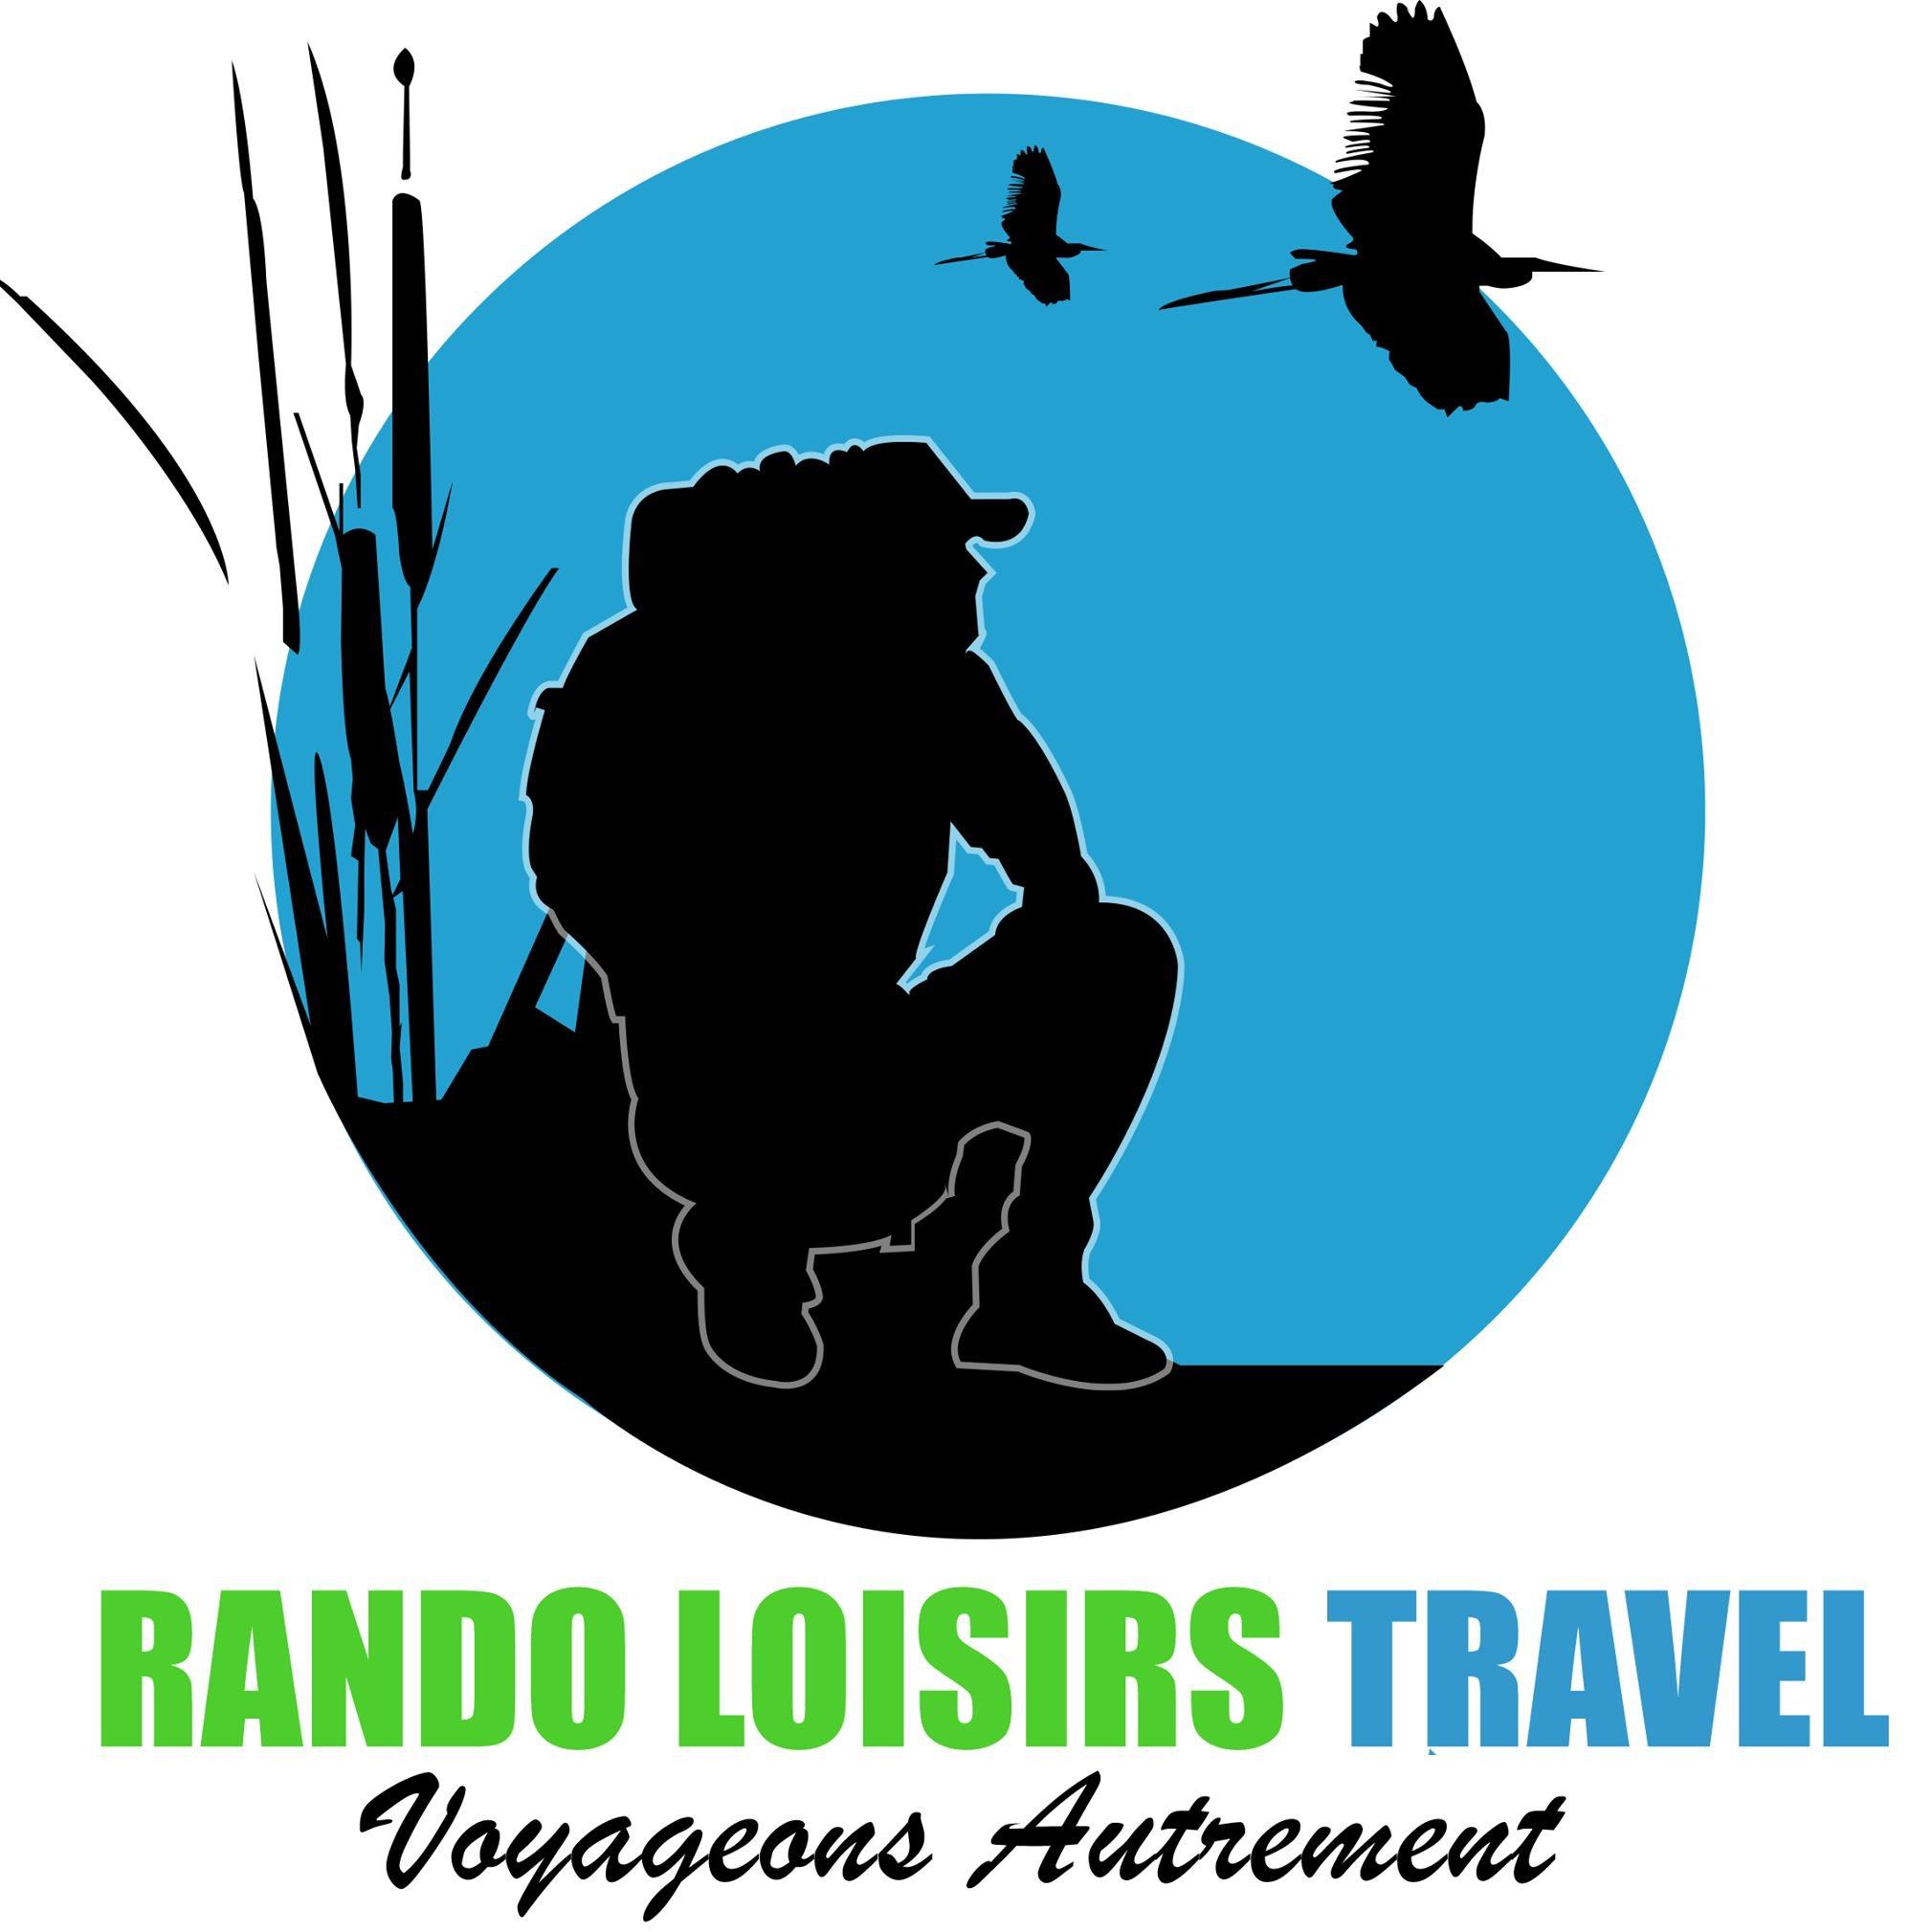 Rando Loisirs Travel